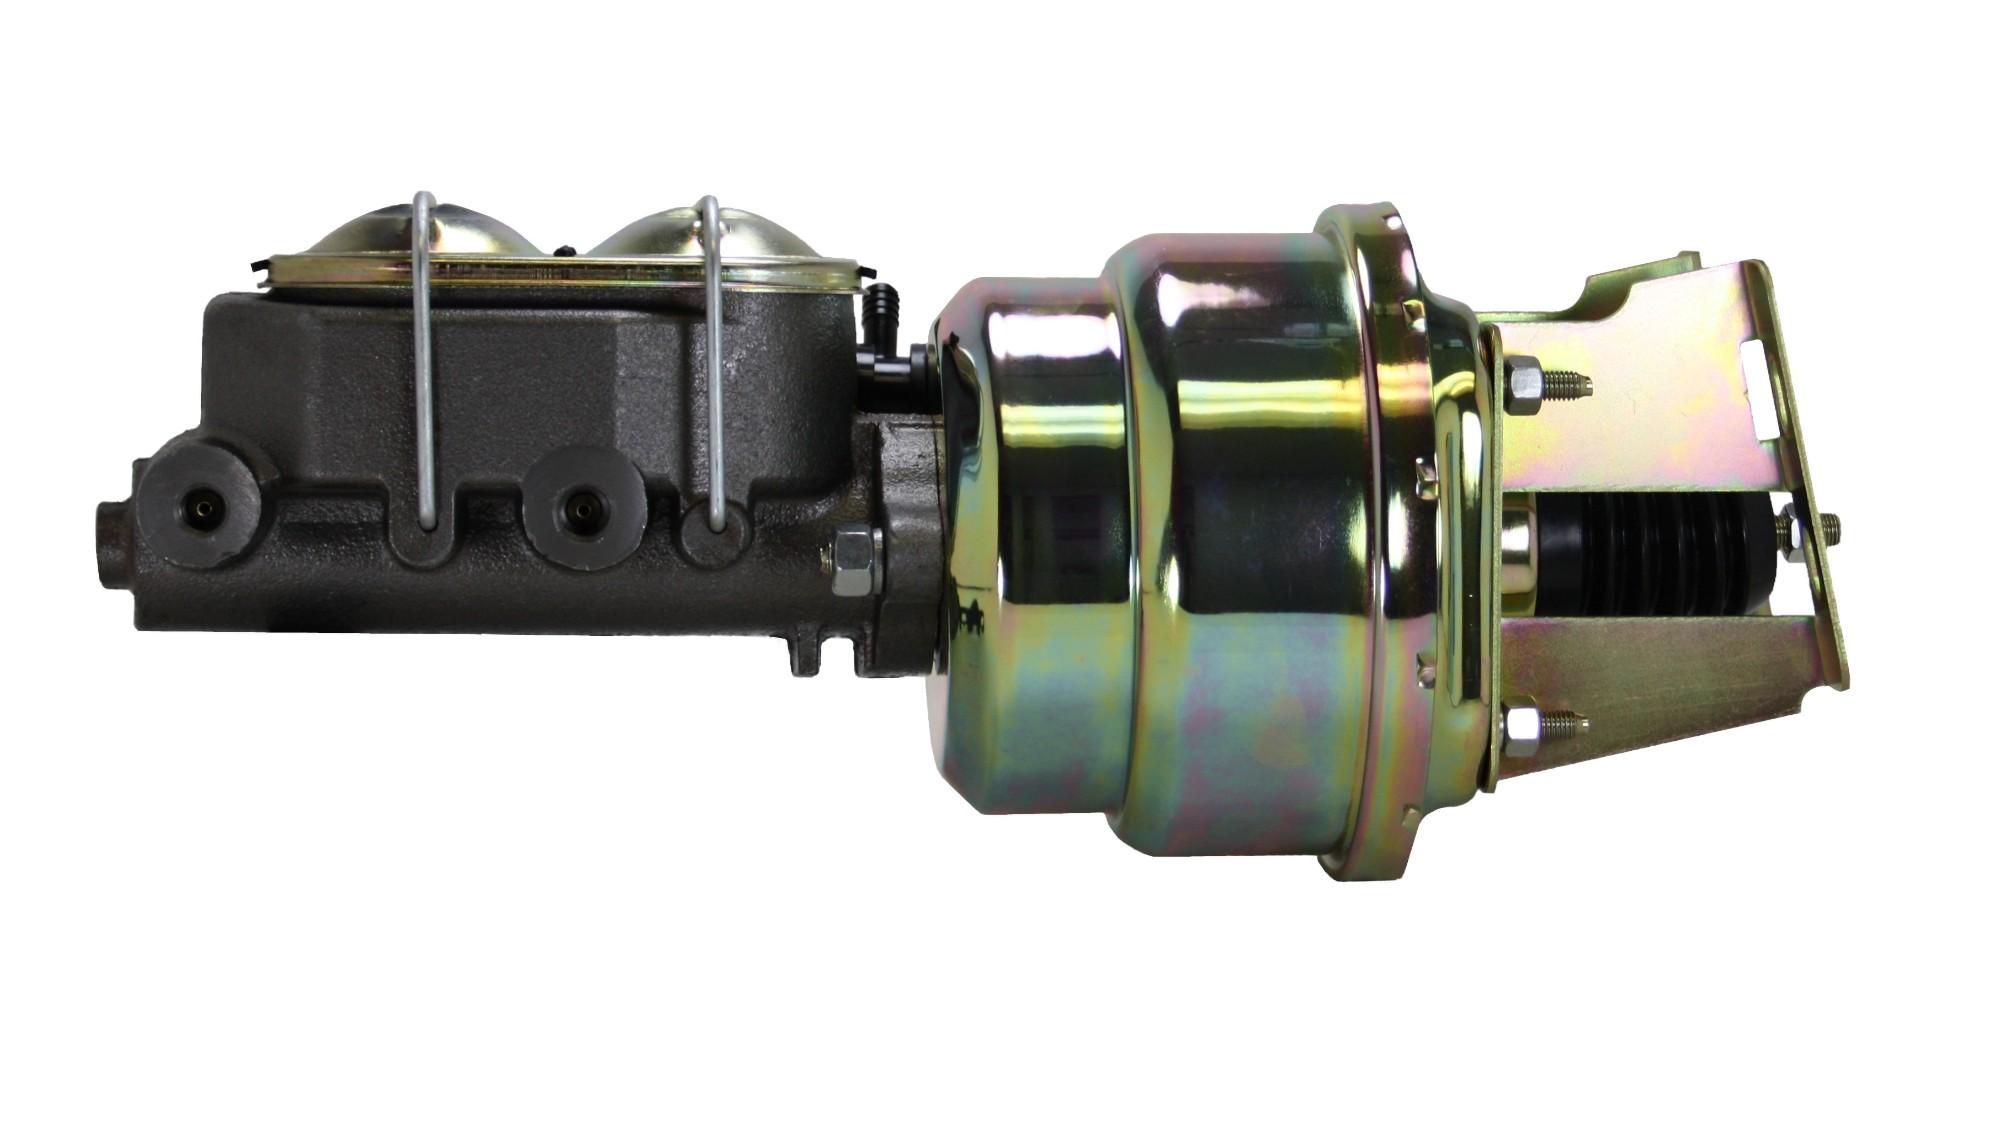 LEED Brakes 3K1 7 in Dual Power Booster ,1-1/8in Bore, (Zinc)